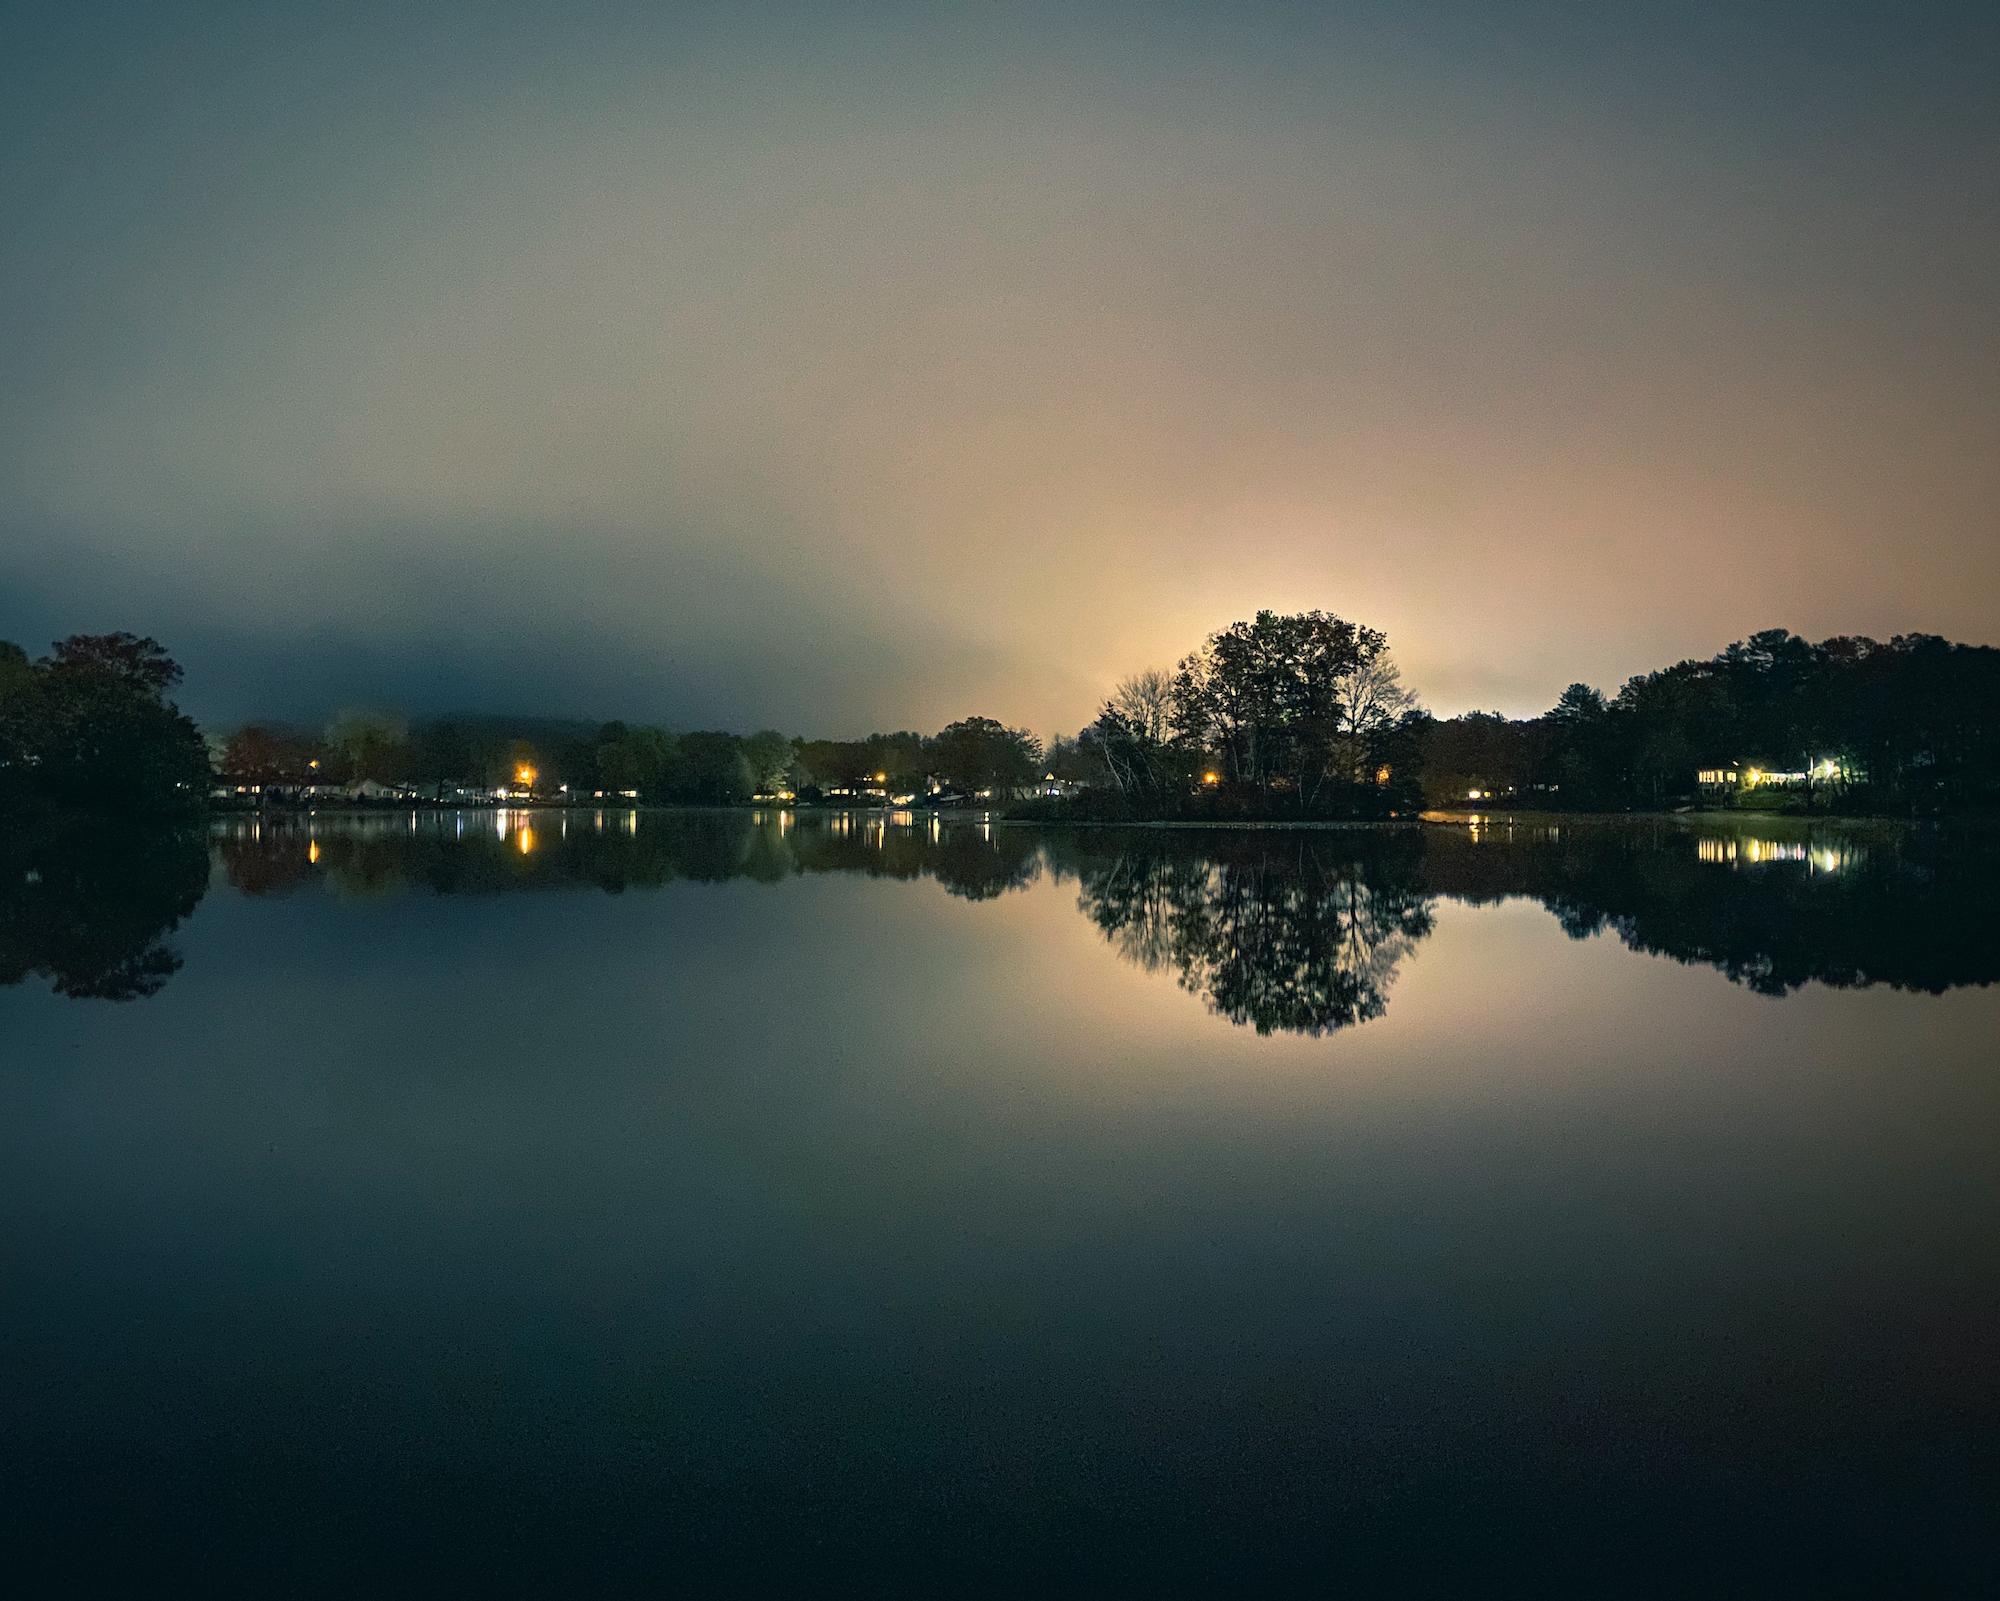 Haviland Pond, Ludlow, MA